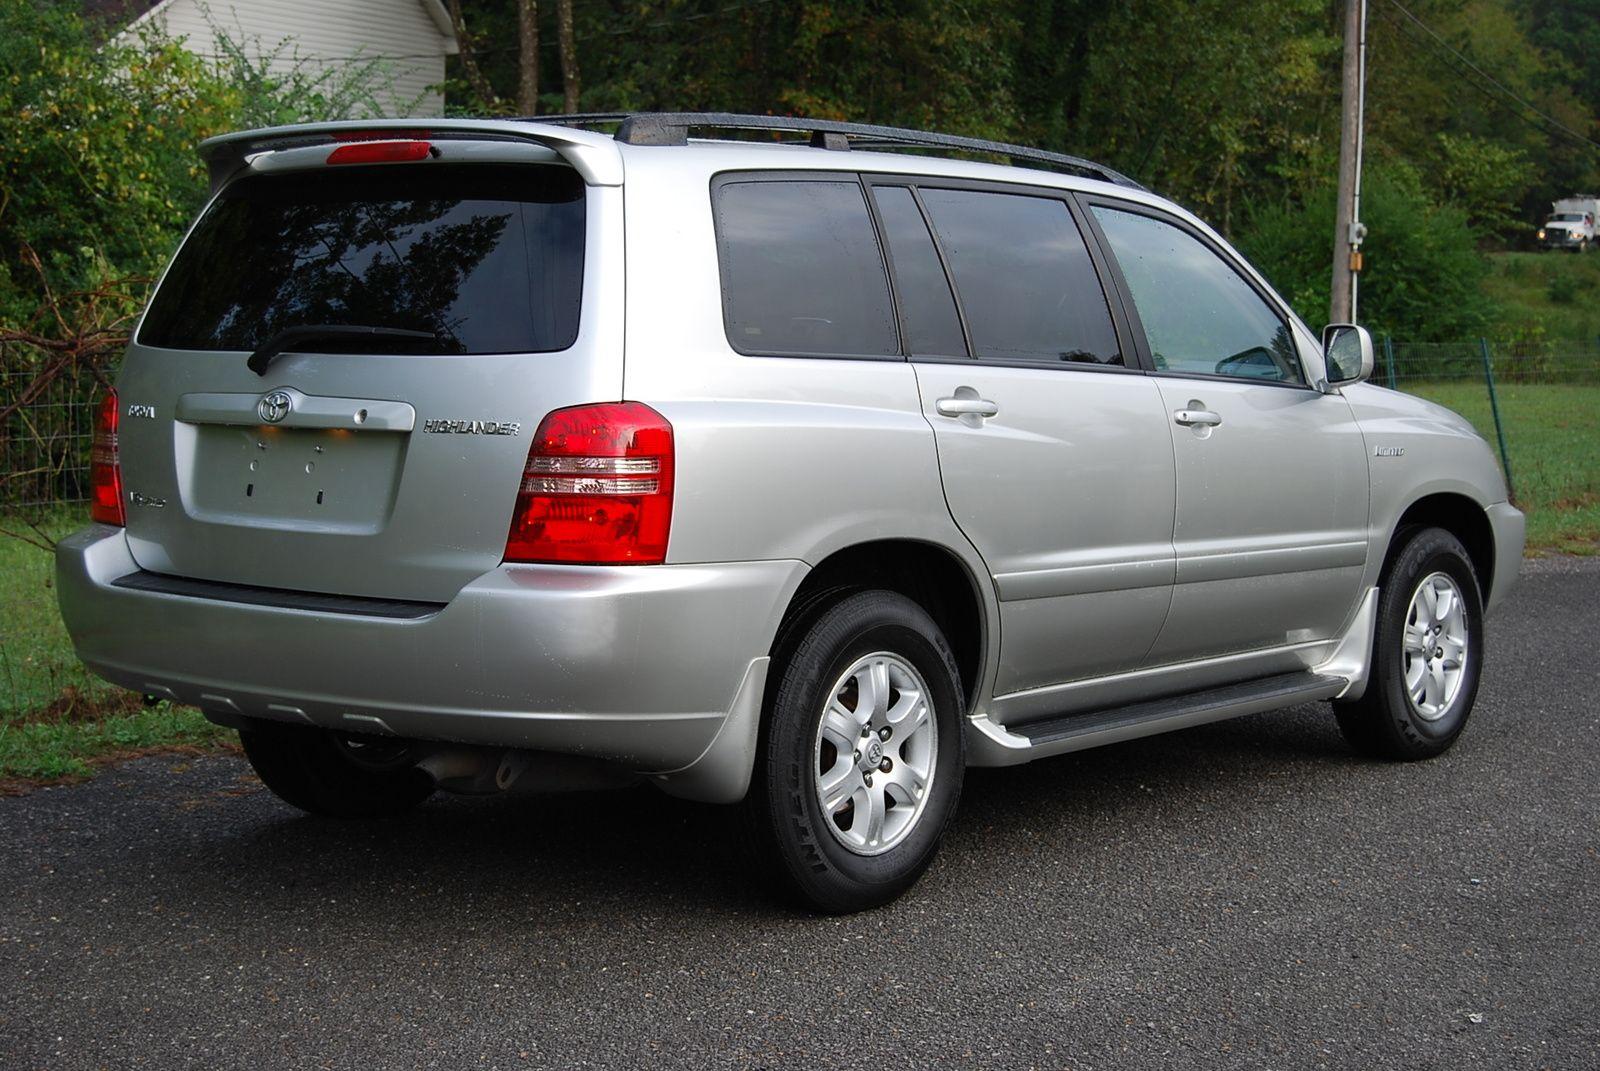 Toyota Highlander 2002 - Google Search | Toyota | Pinterest